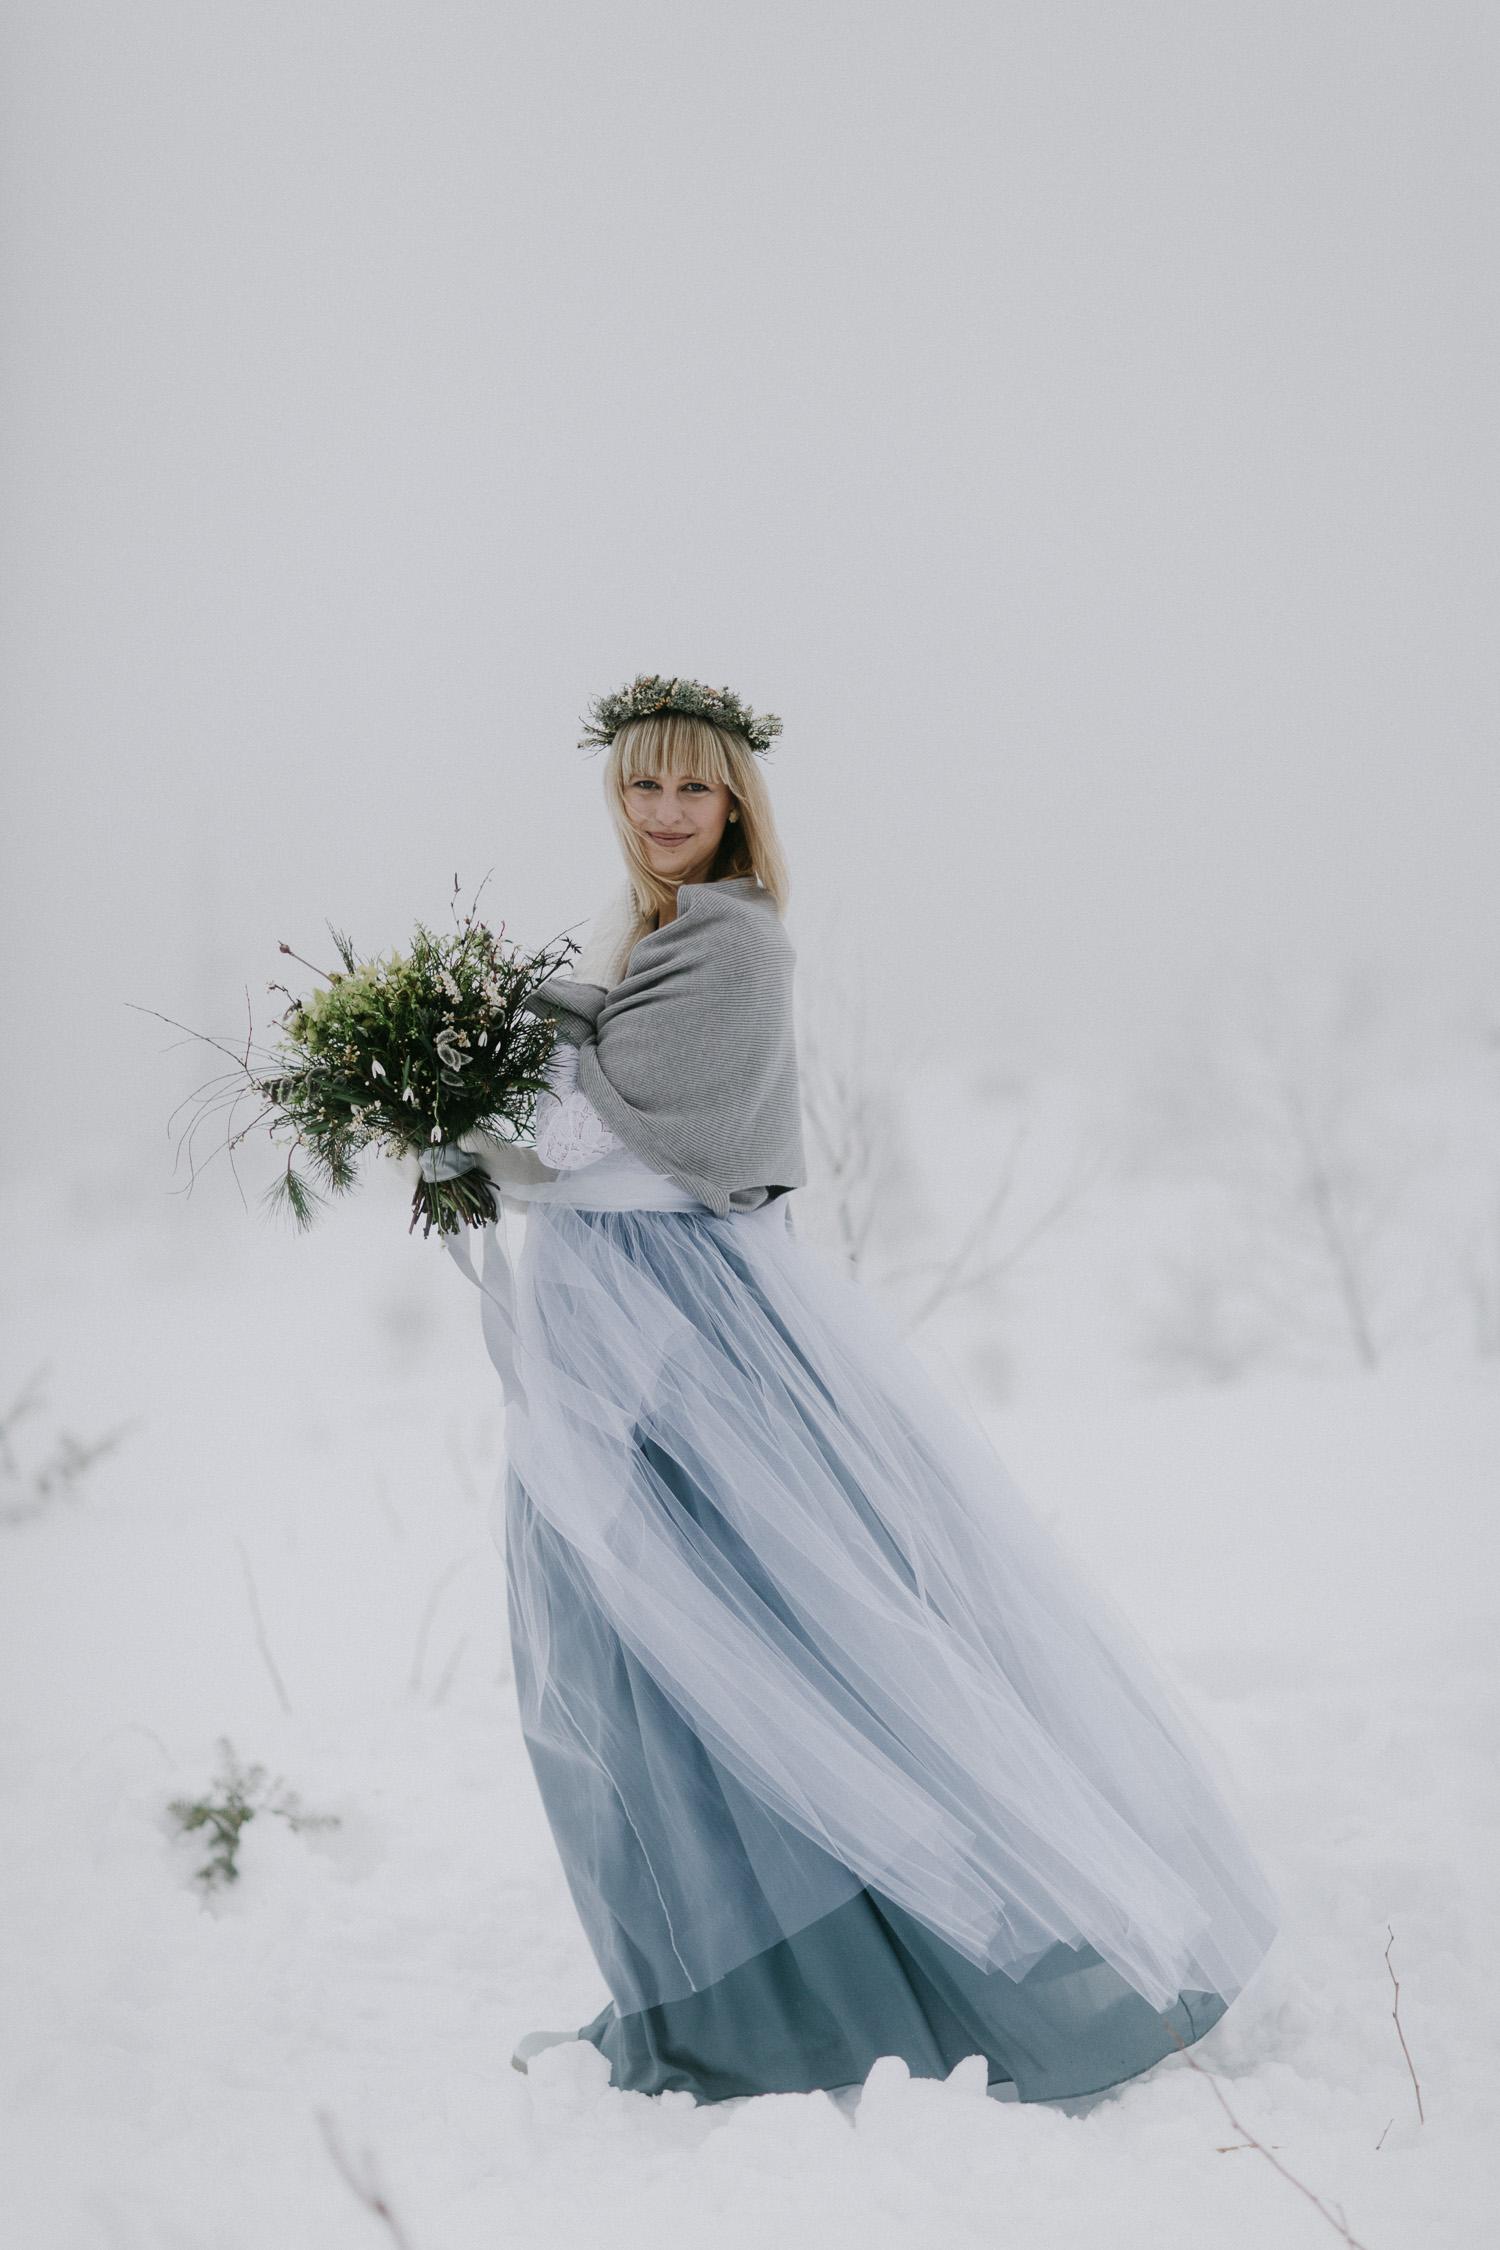 324-everbay-secret-wedding-IMG_5058.jpg